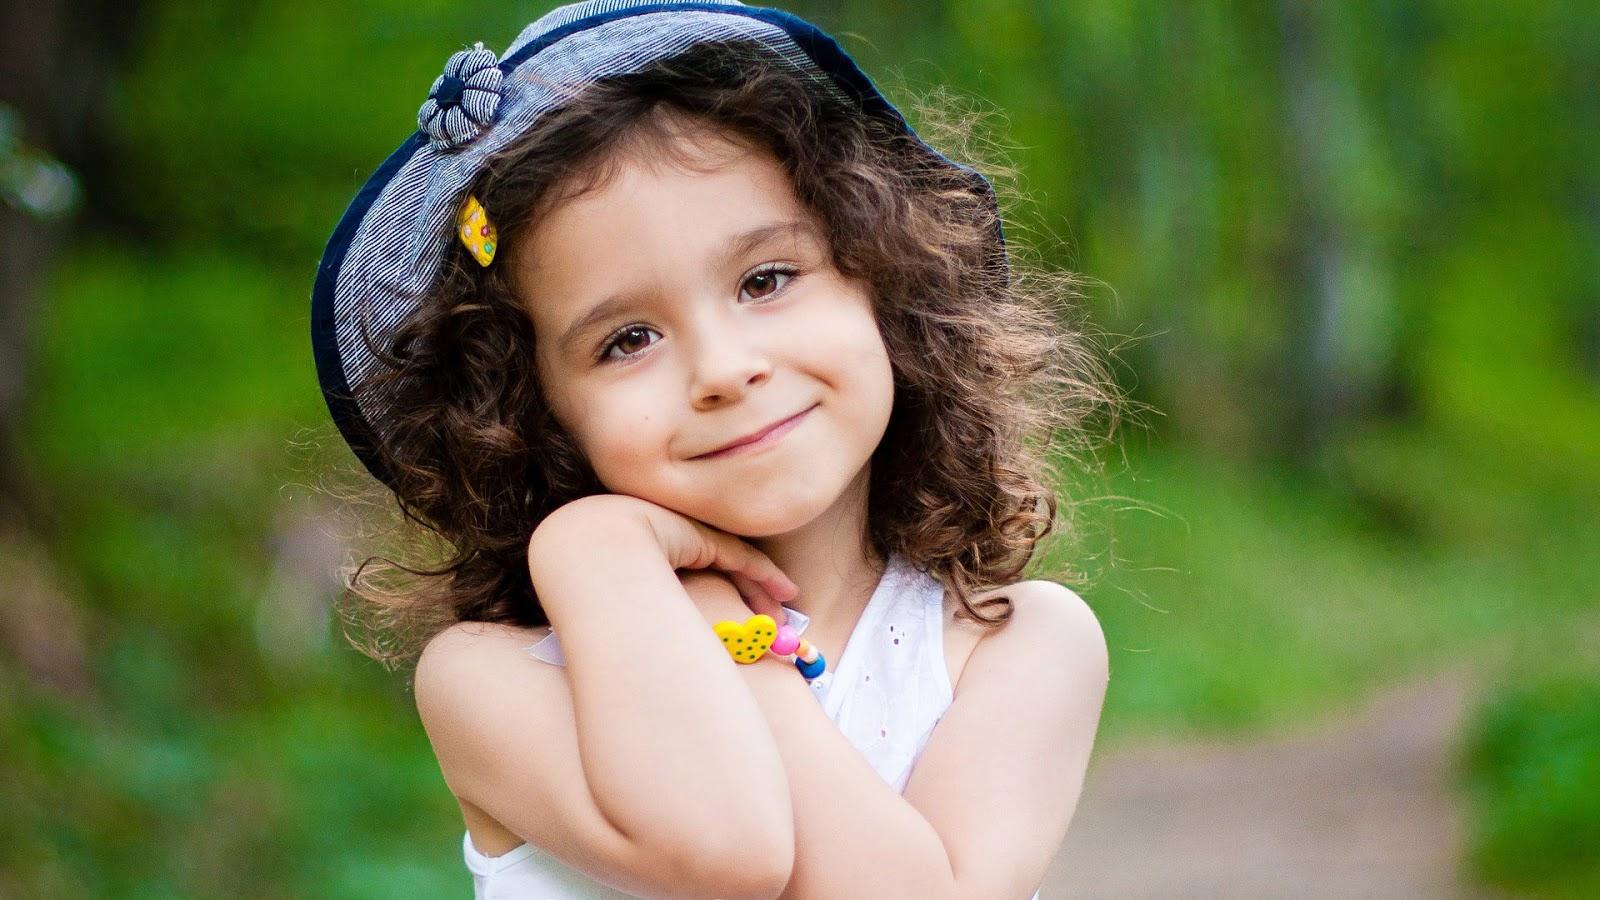 Very cute baby wallpaper wallpapersafari - Cute little girl pic hd ...